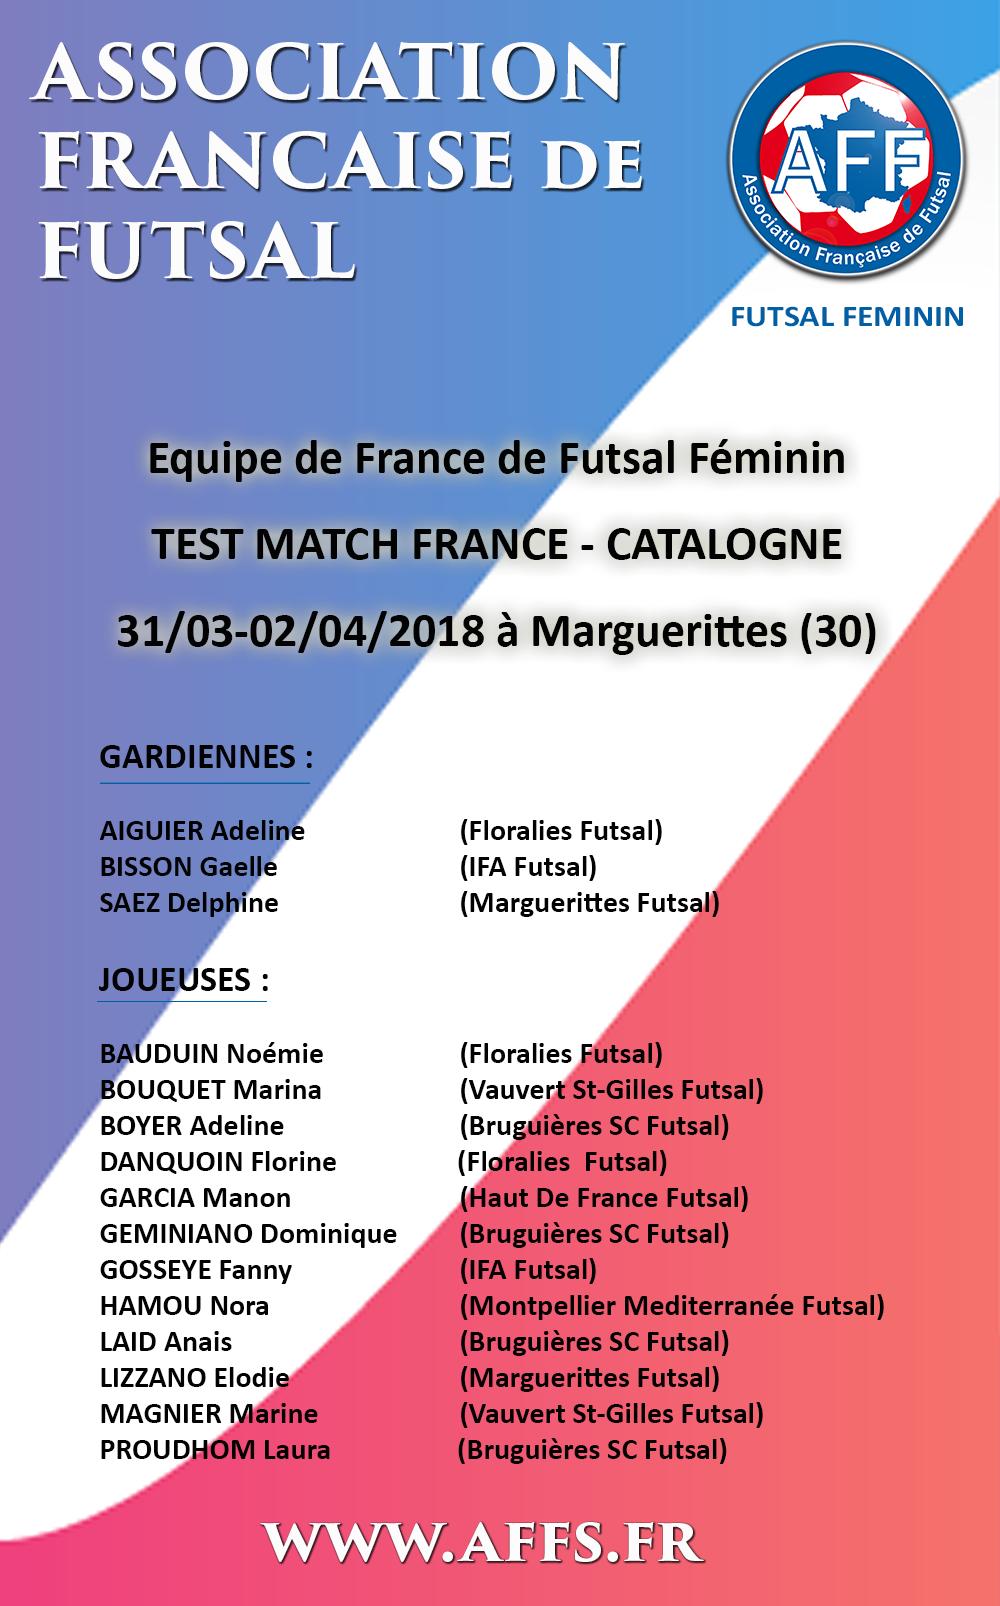 convocation-france-catalogne-edf-feminine-futsal-amf-aff